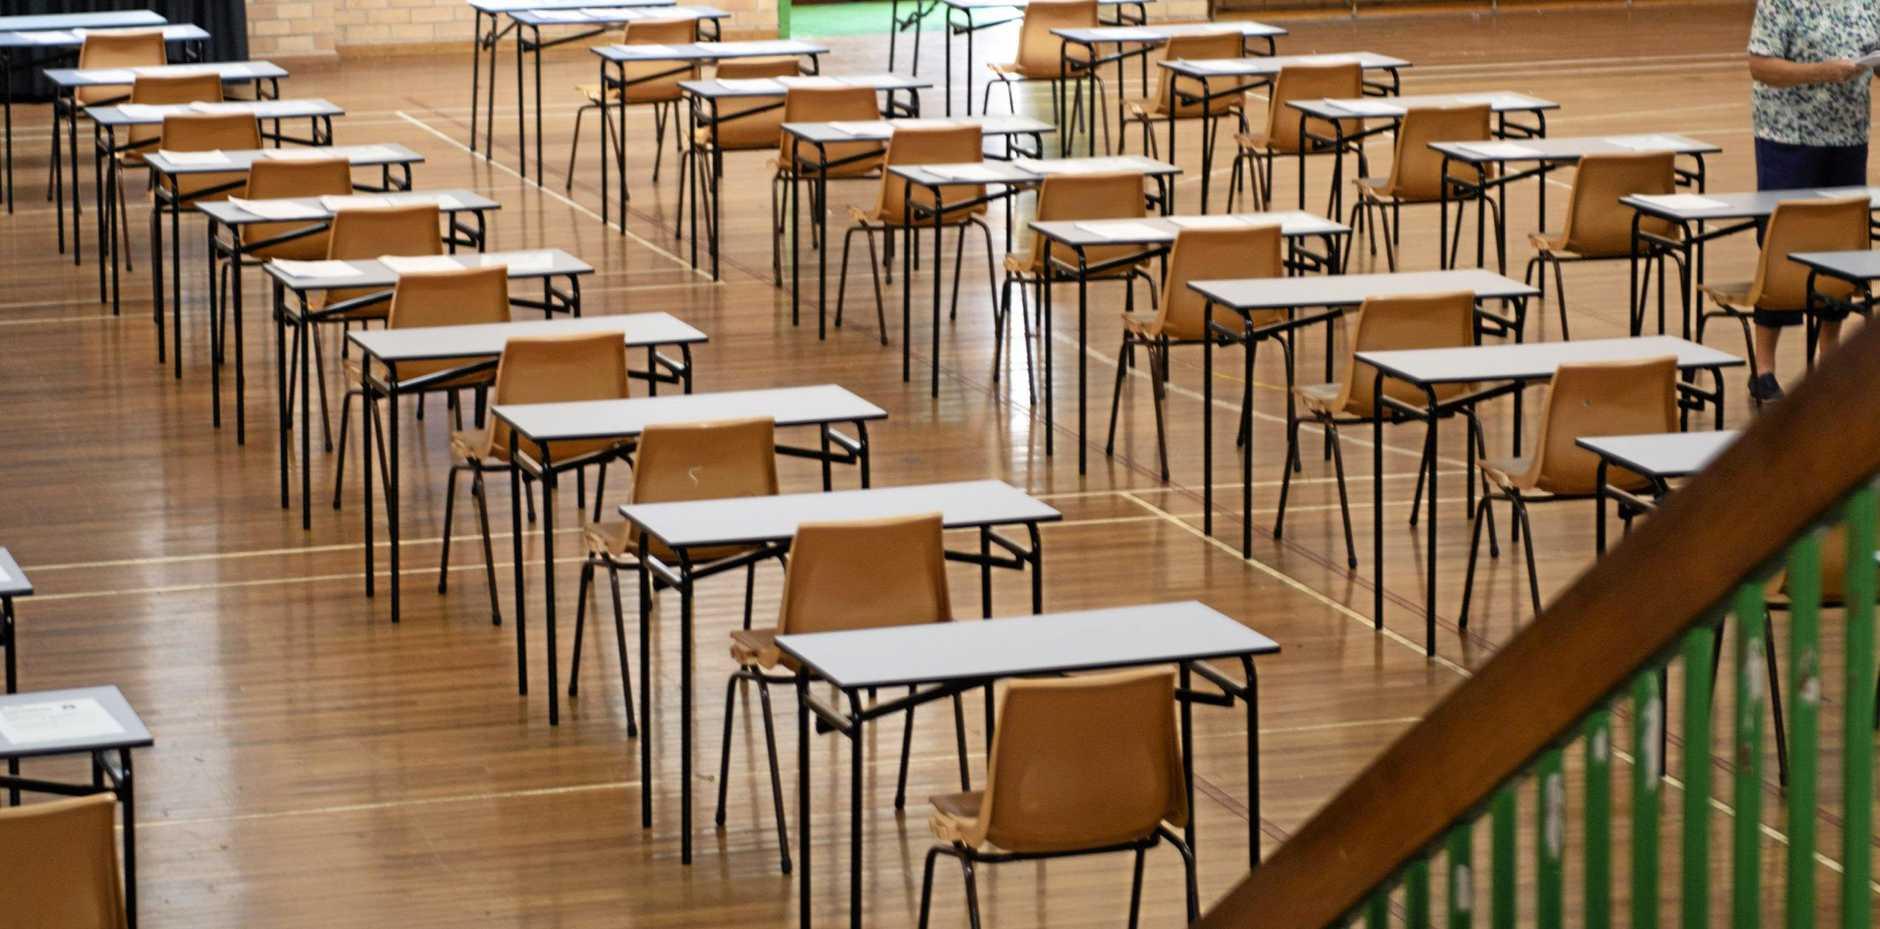 Queensland schools have been ranked based on OP results.